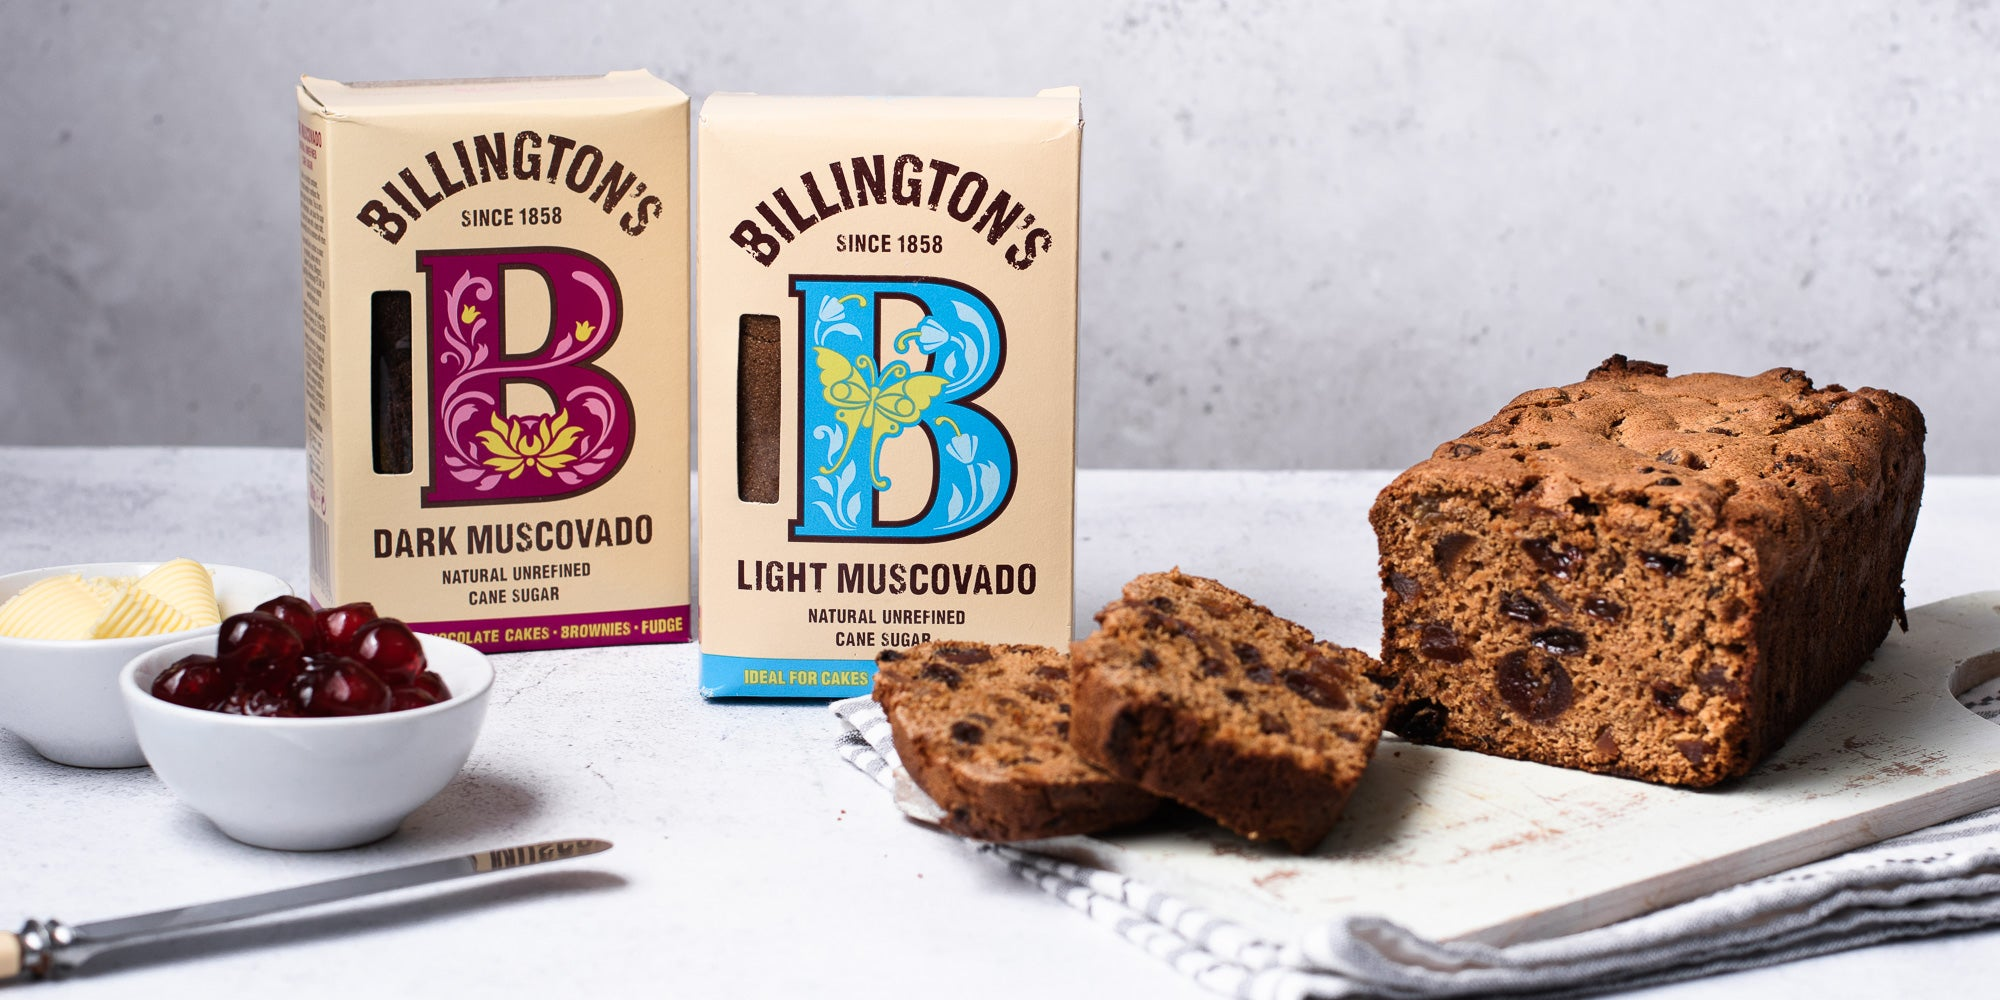 Billington's light and dark muscovado sugar next to a loaf of Irish Tea Brack sliced on a serving board